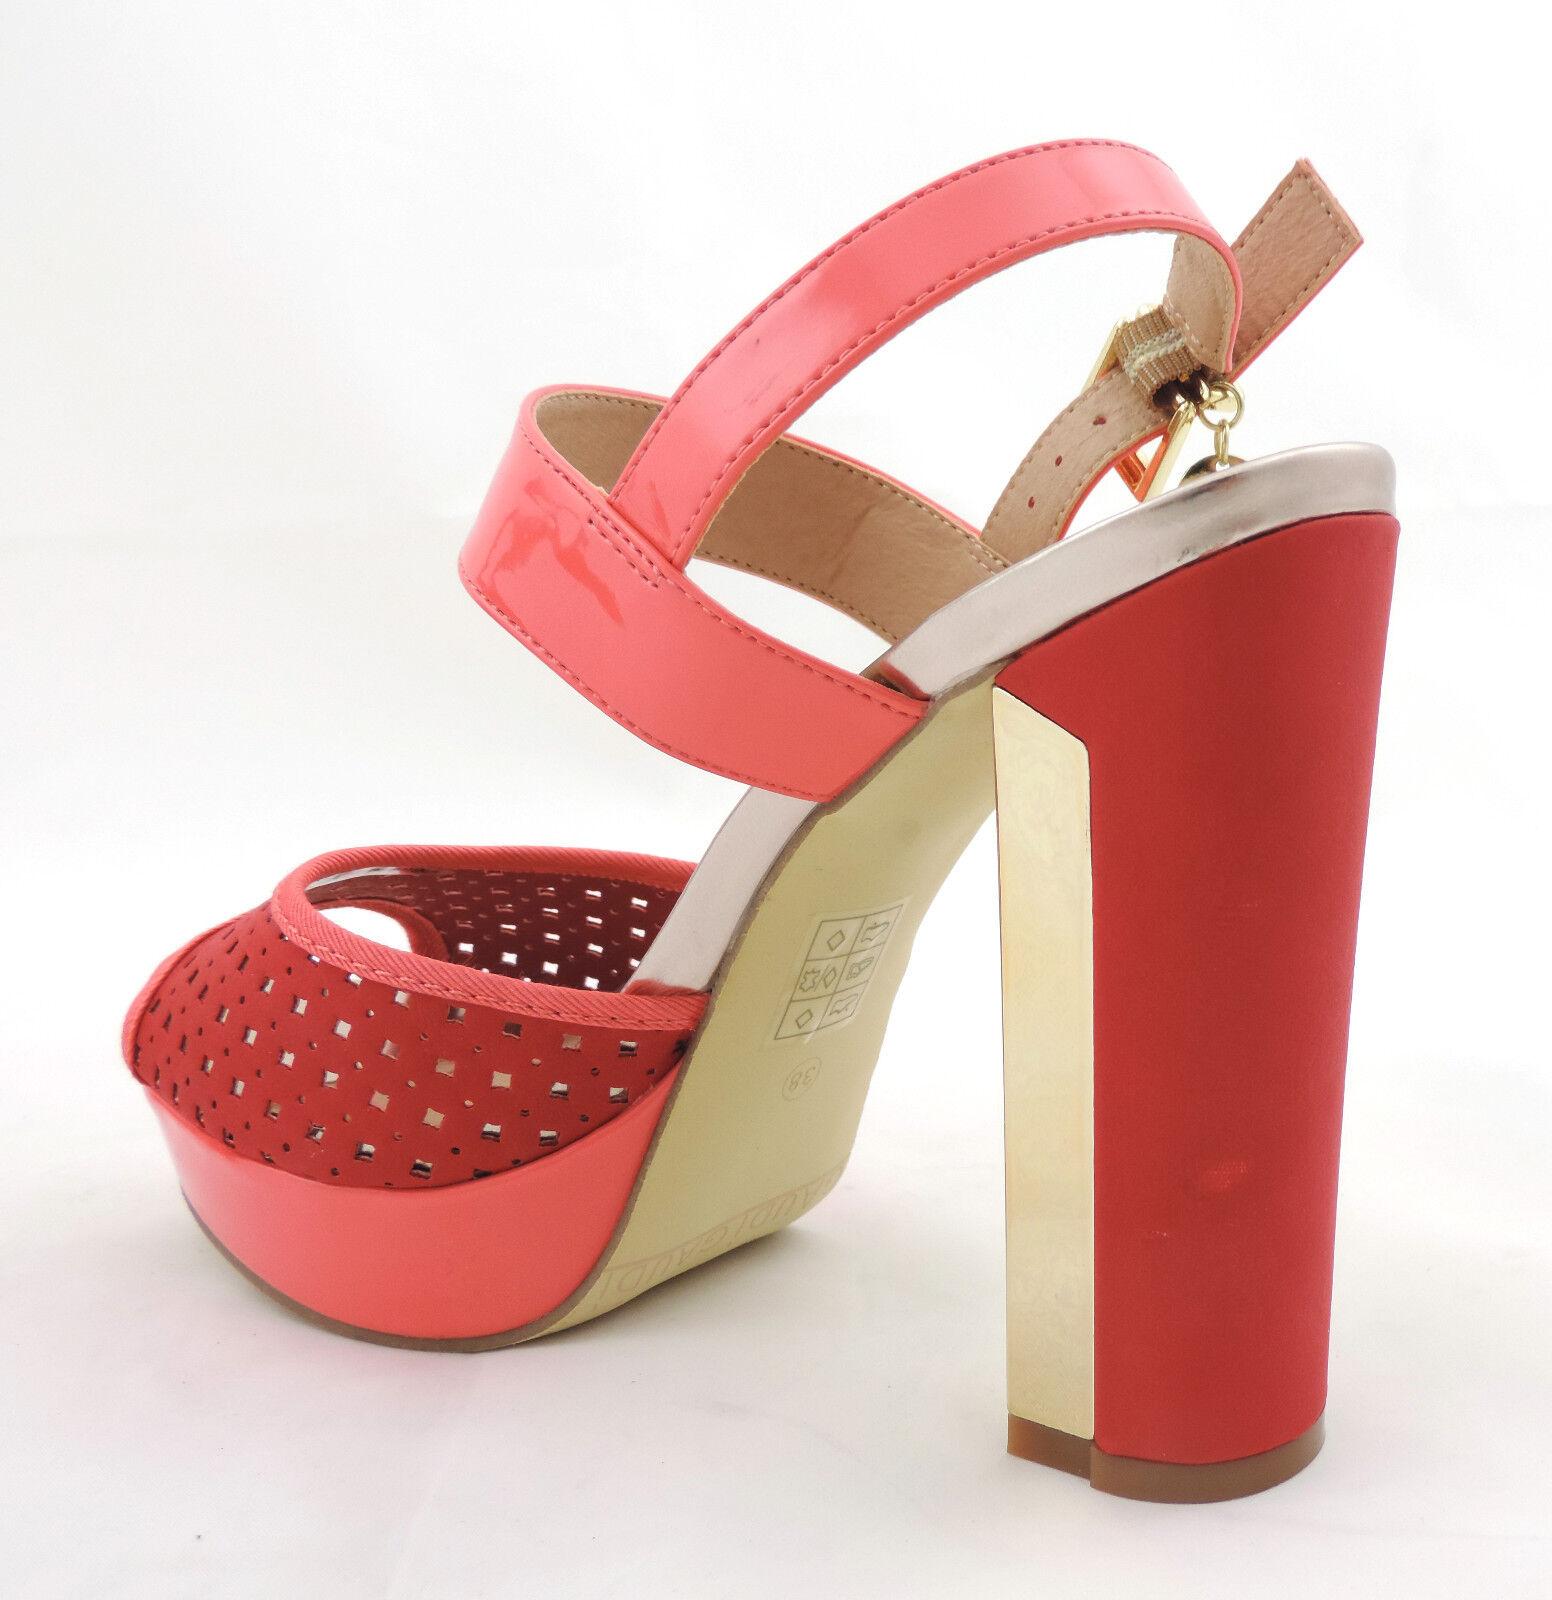 Gaudi  Sandale high heels rosa neu lachs  Schuhe pumps neu rosa 056d20